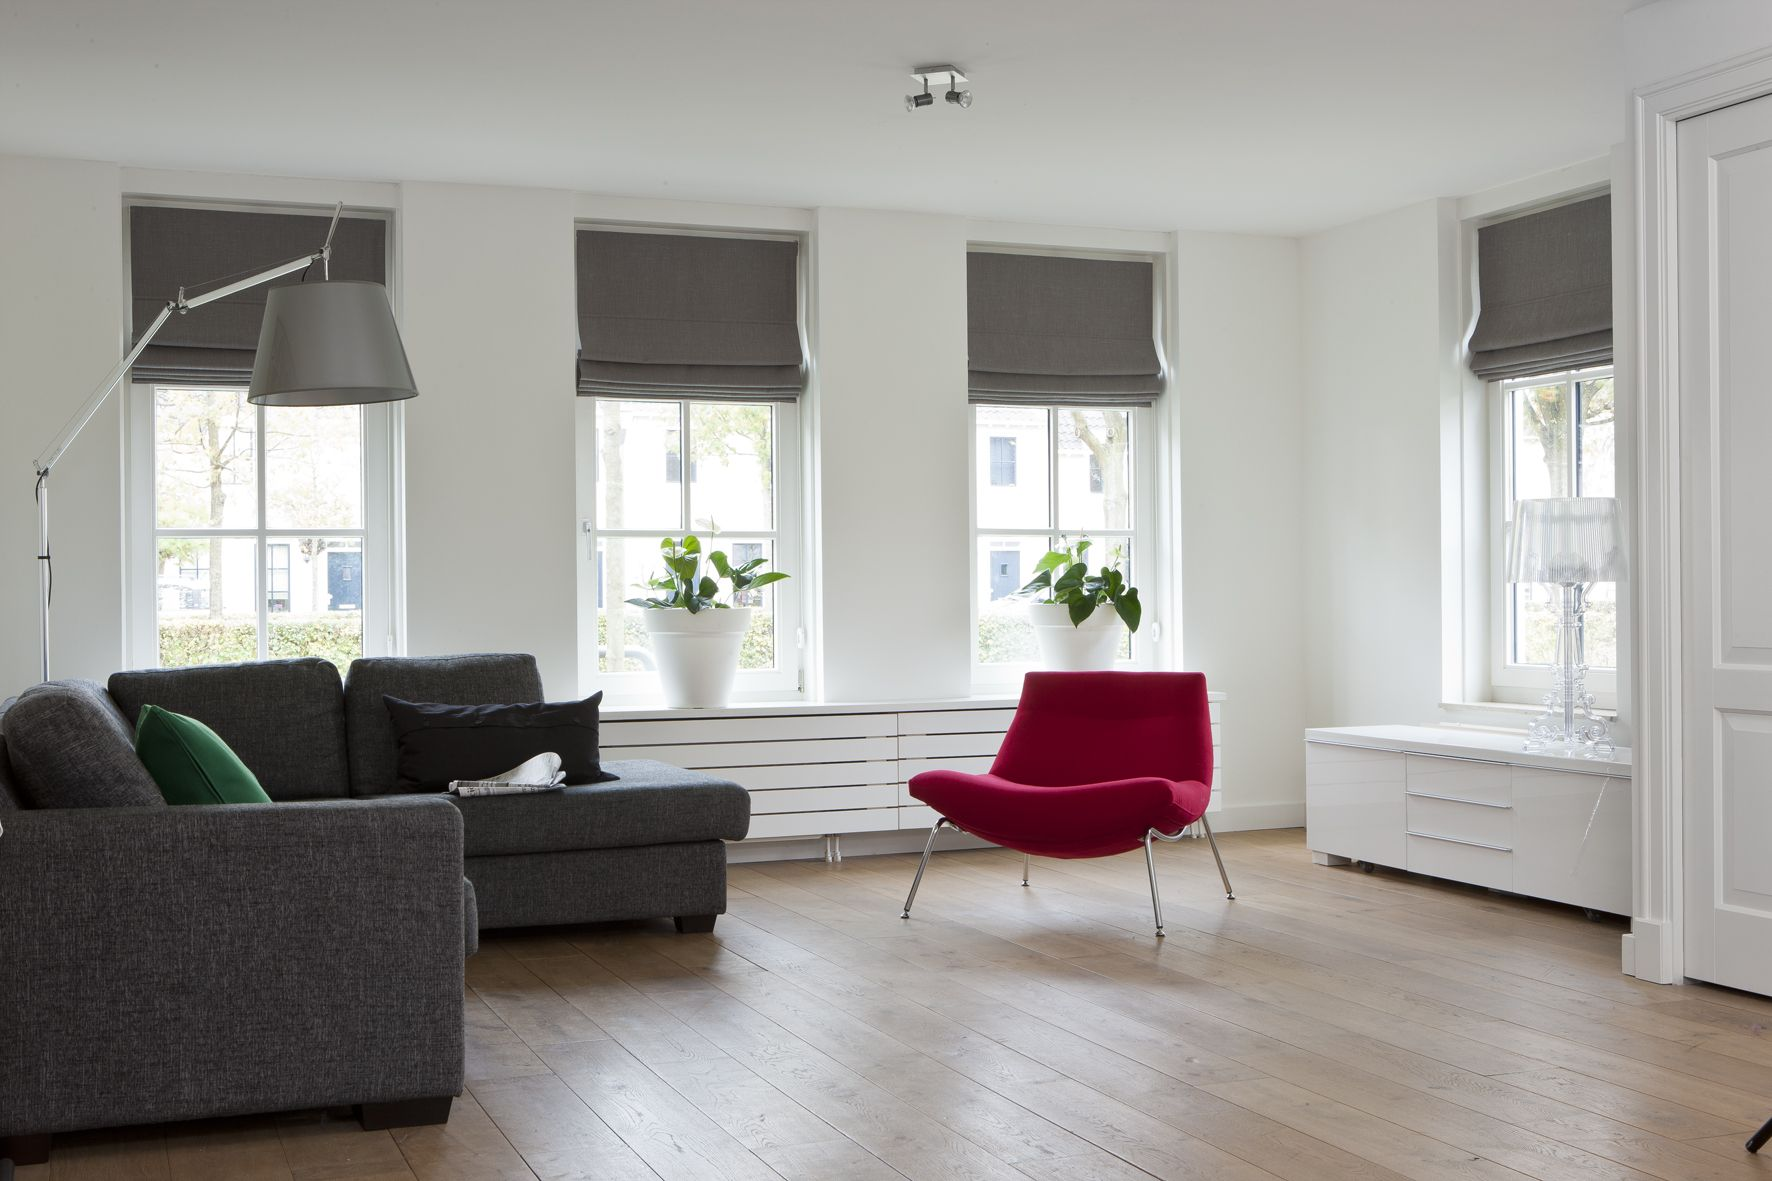 Vouwgordijnen landelijke stijl for the home pinterest for Slaapkamer landelijk modern